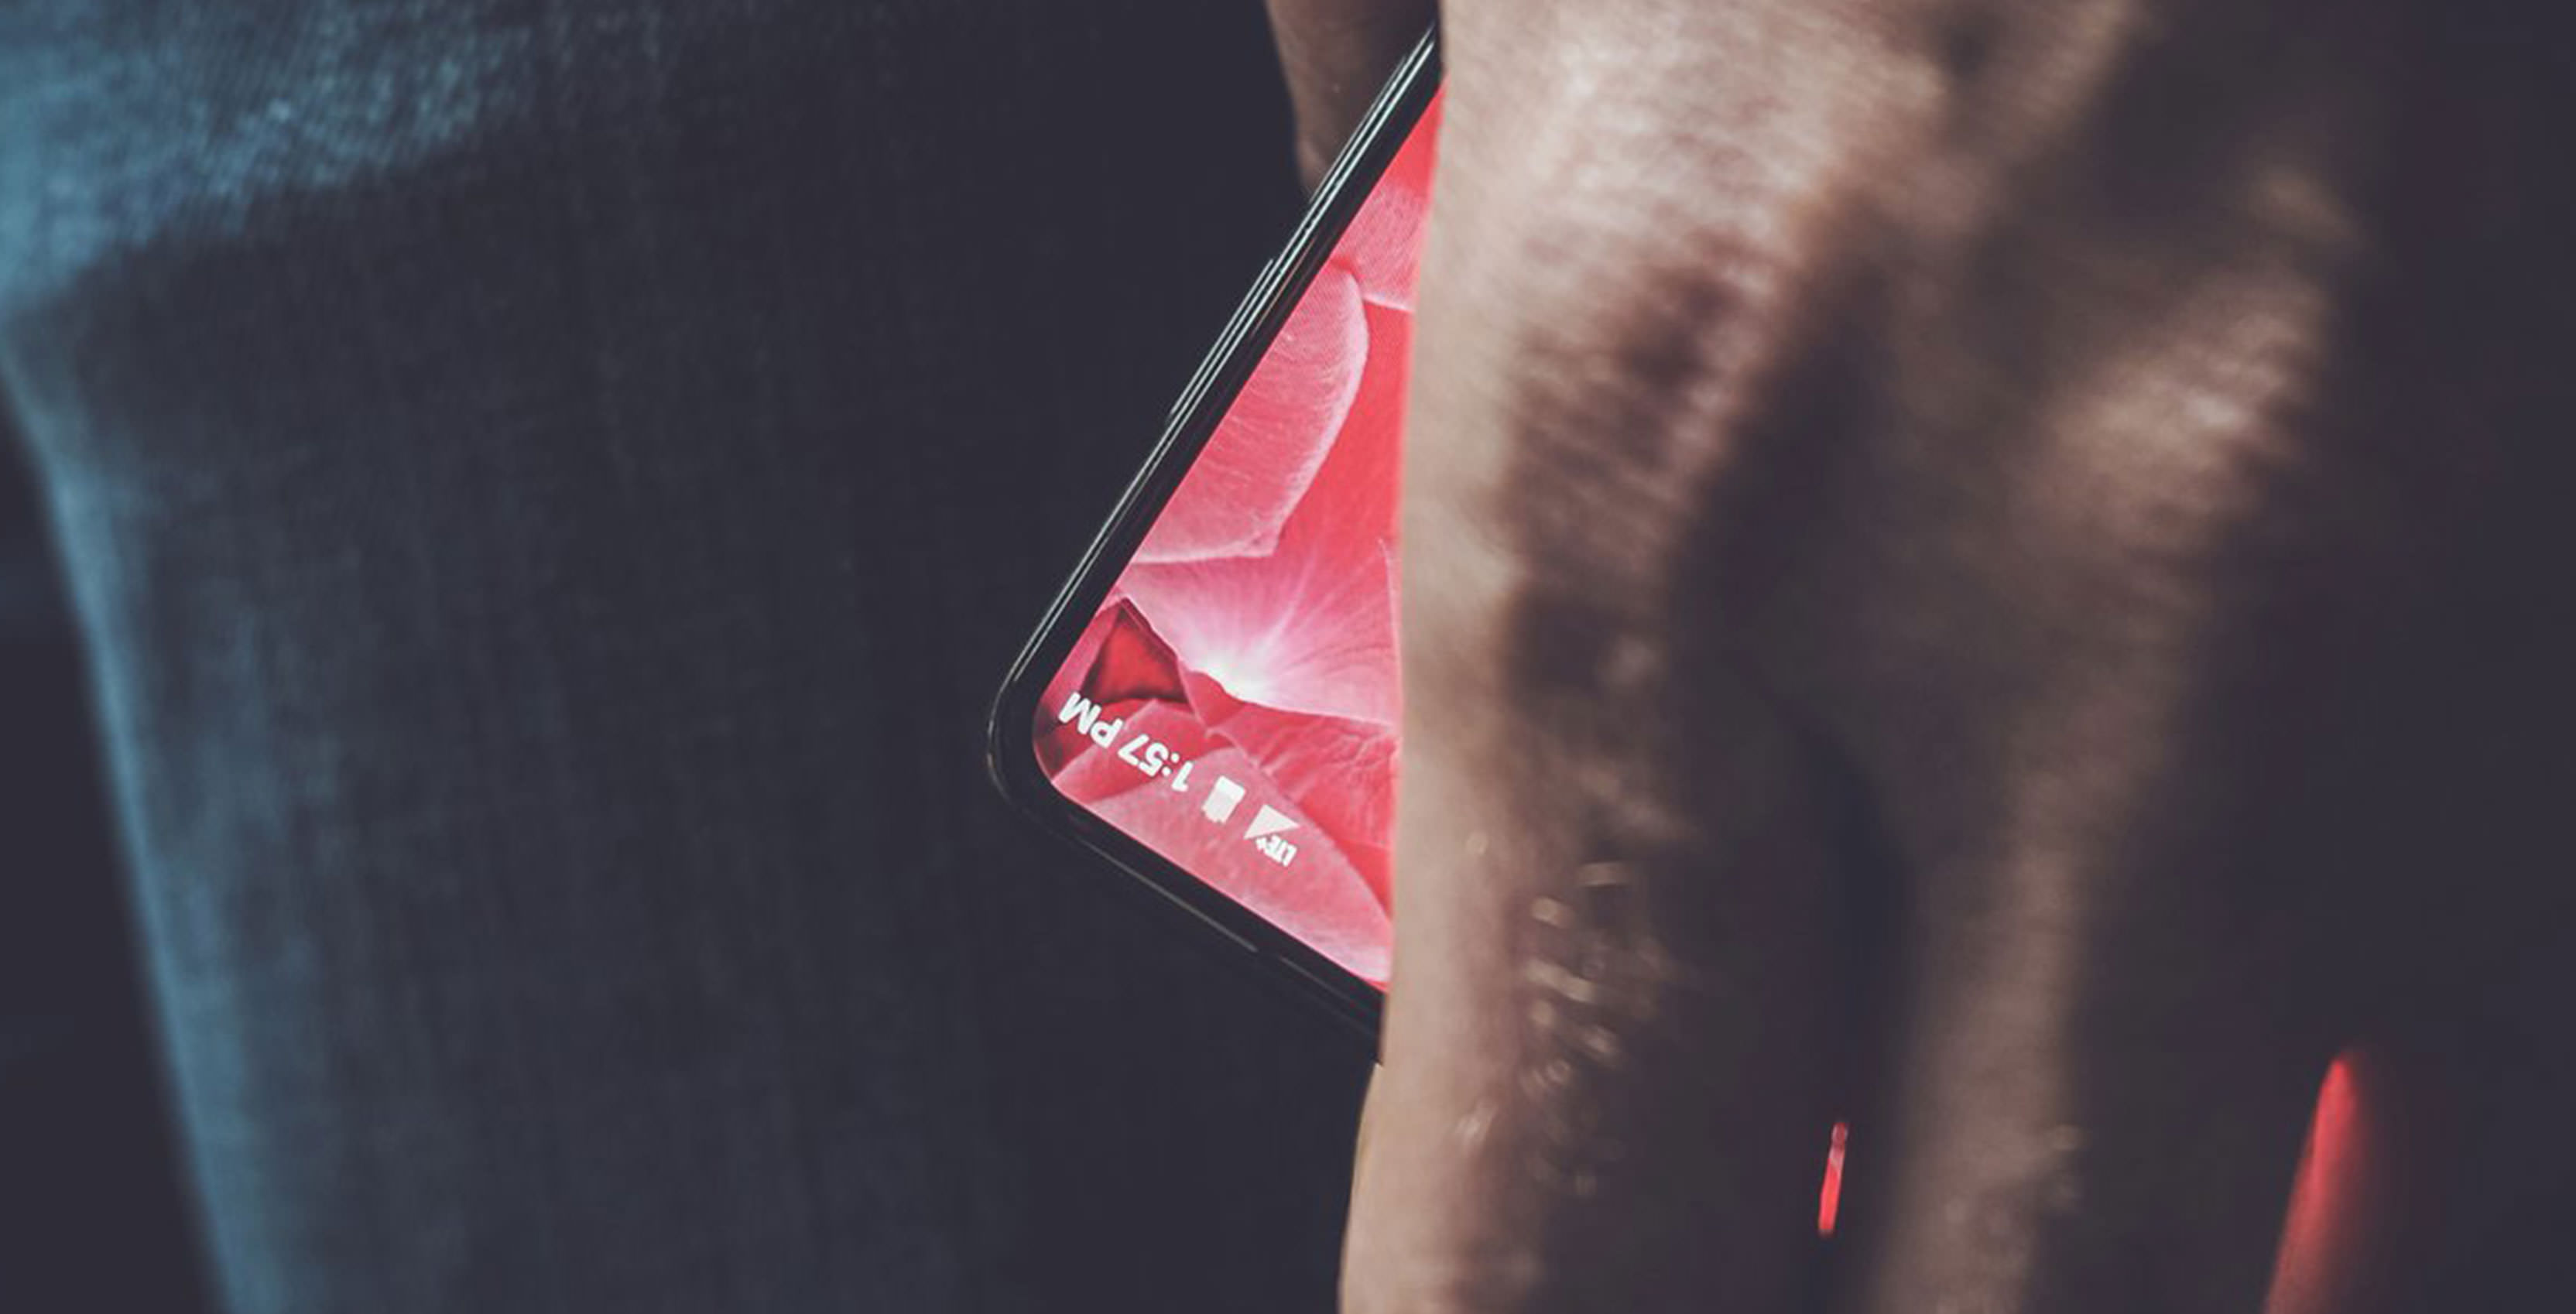 Andy Rubin new smartphone